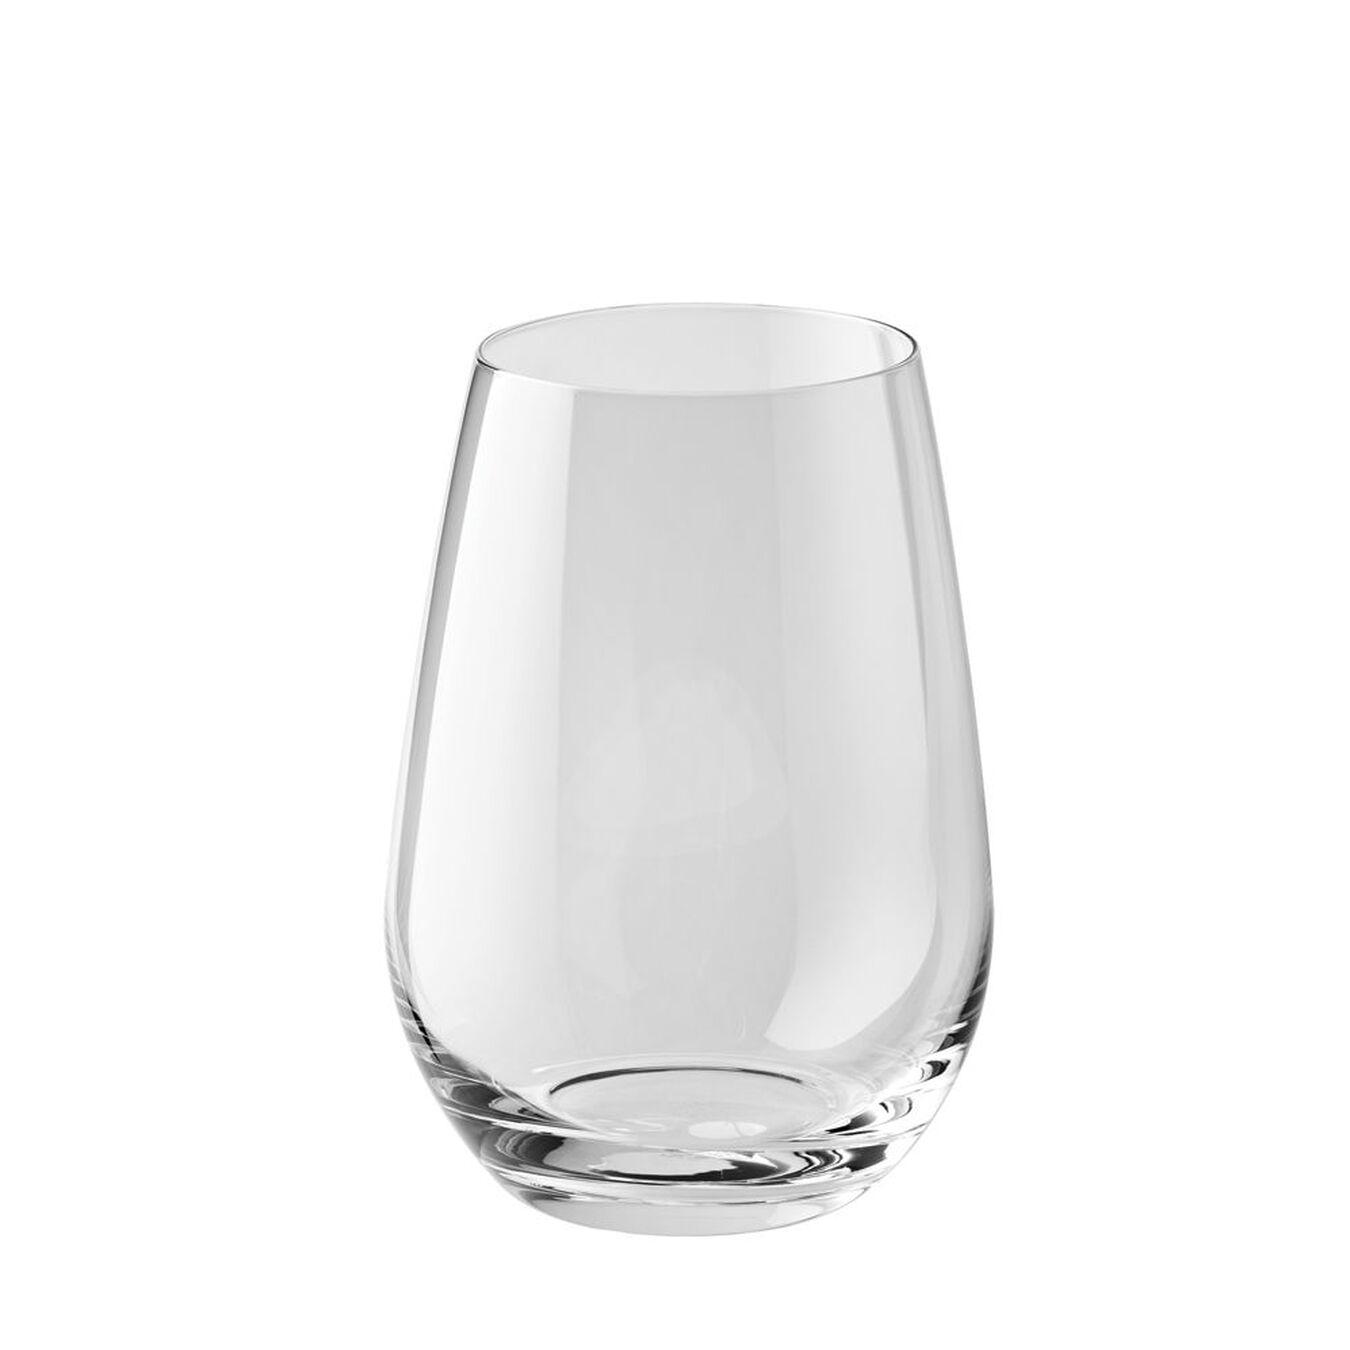 6 Piece Beverage Glass 19.1 oz/566 ml,,large 1